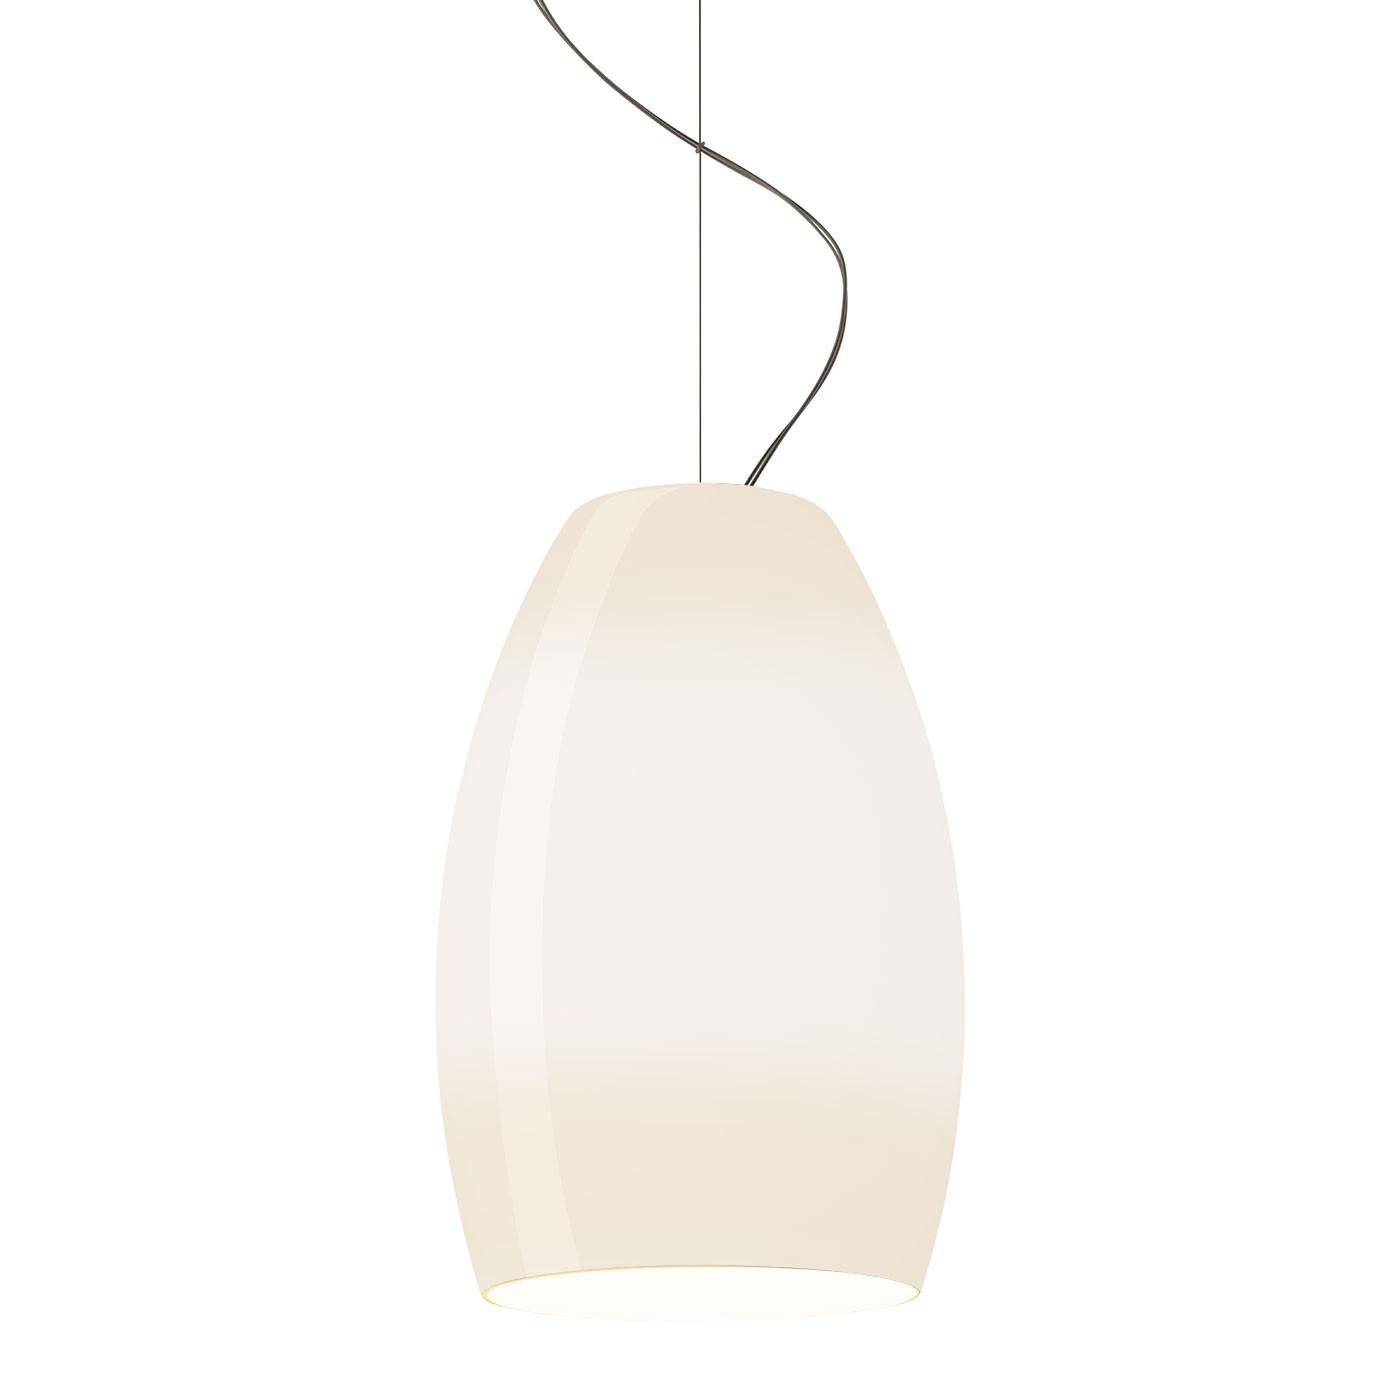 Foscarini Buds 1 Sospensione LED